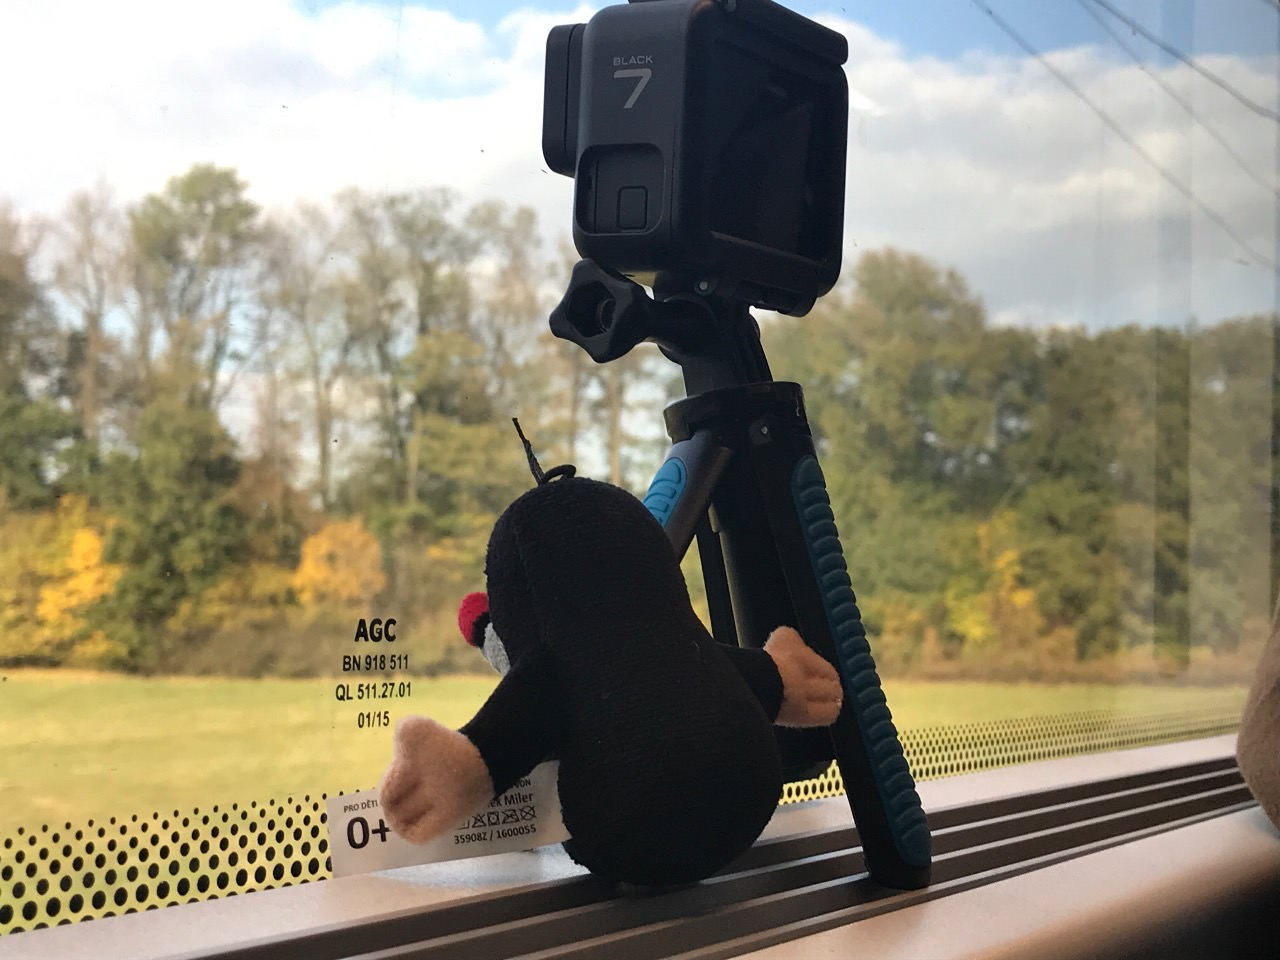 【GoPro7】チェコの鉄道「RagioJet」でタイムラプス撮影! #チェコへ行こう #cz100y